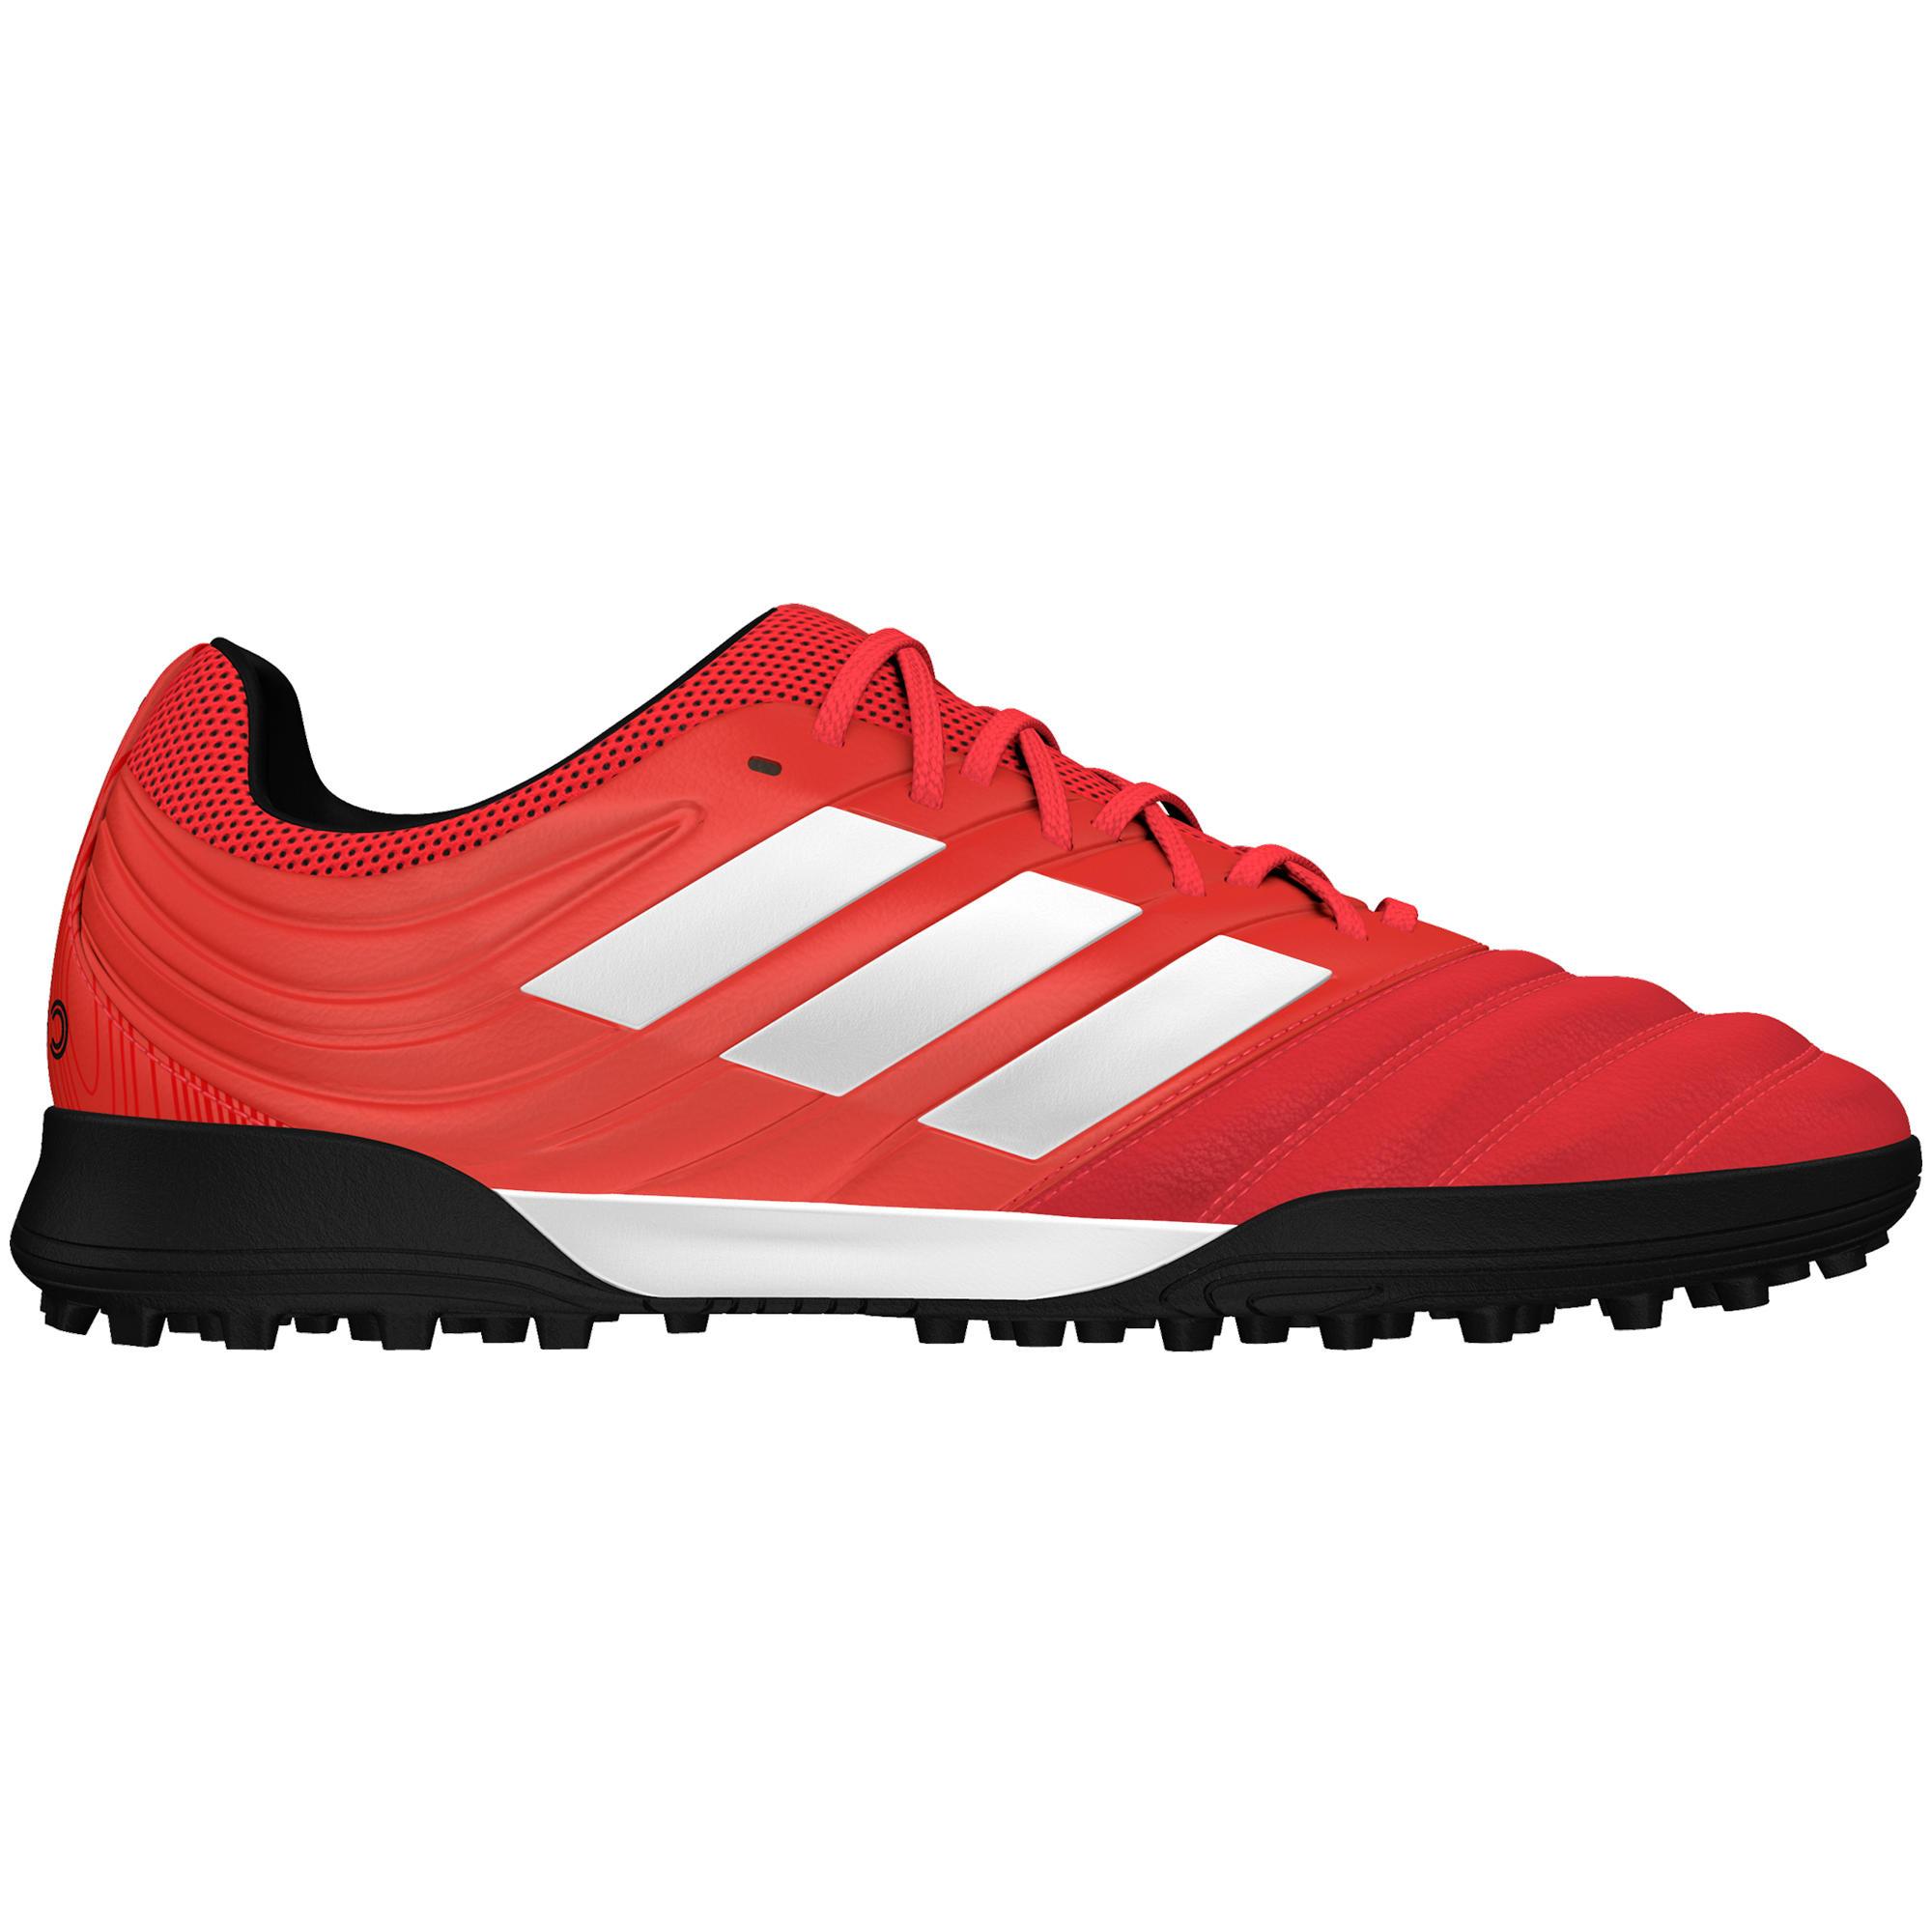 imagen abrazo constructor  botas adidas rojas Off 63% - gupteshworcave.com.np